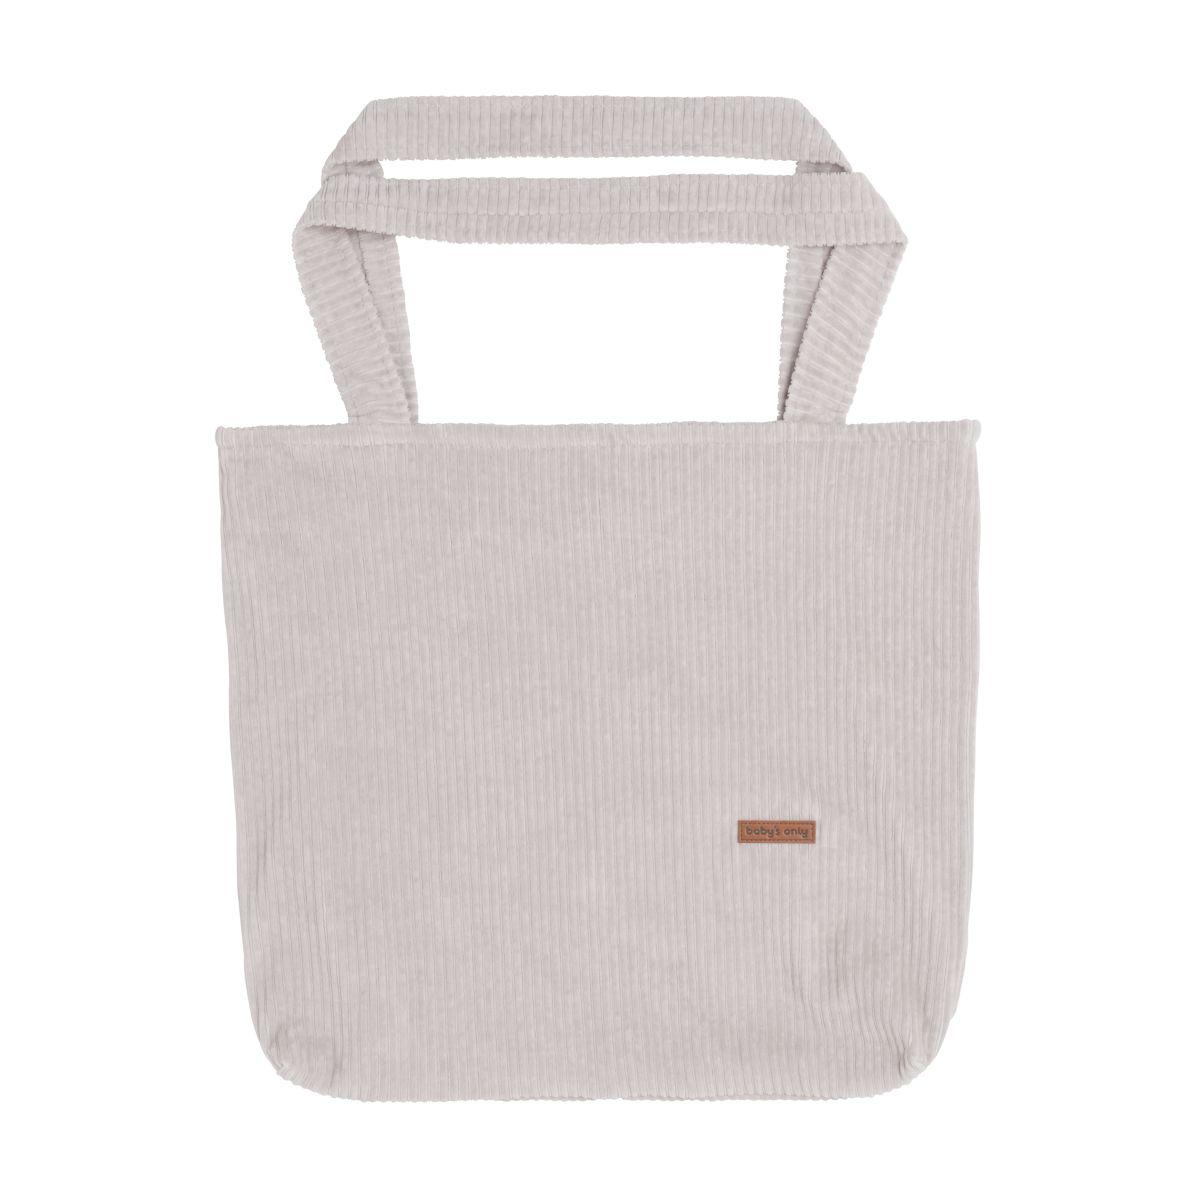 babys only bo02489002350 mom bag sense kiezelgrijs 1